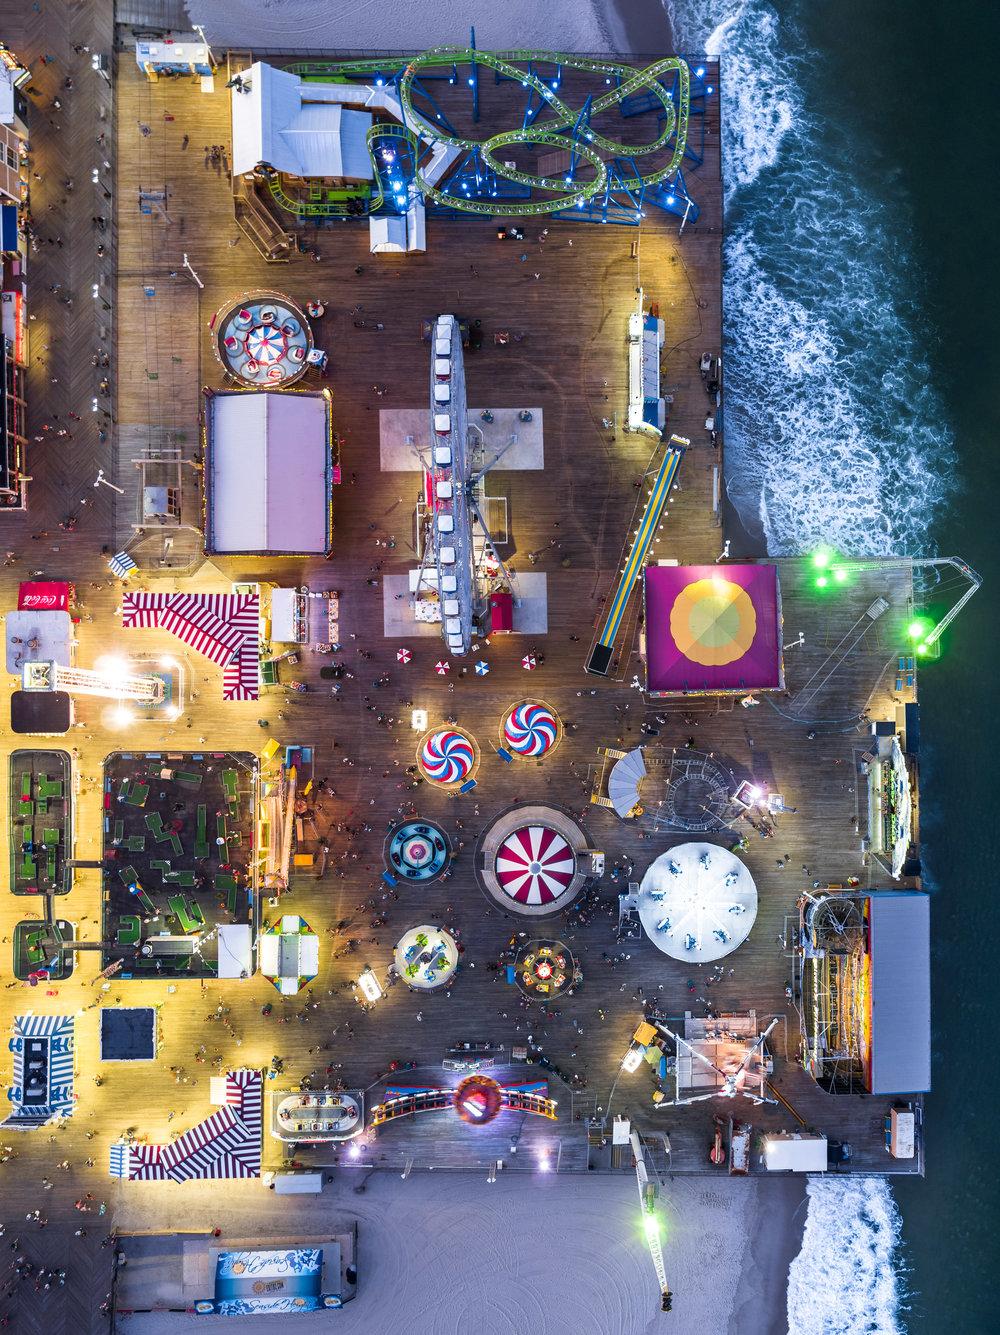 thegamesneverend_typoland_aerial-1.jpg